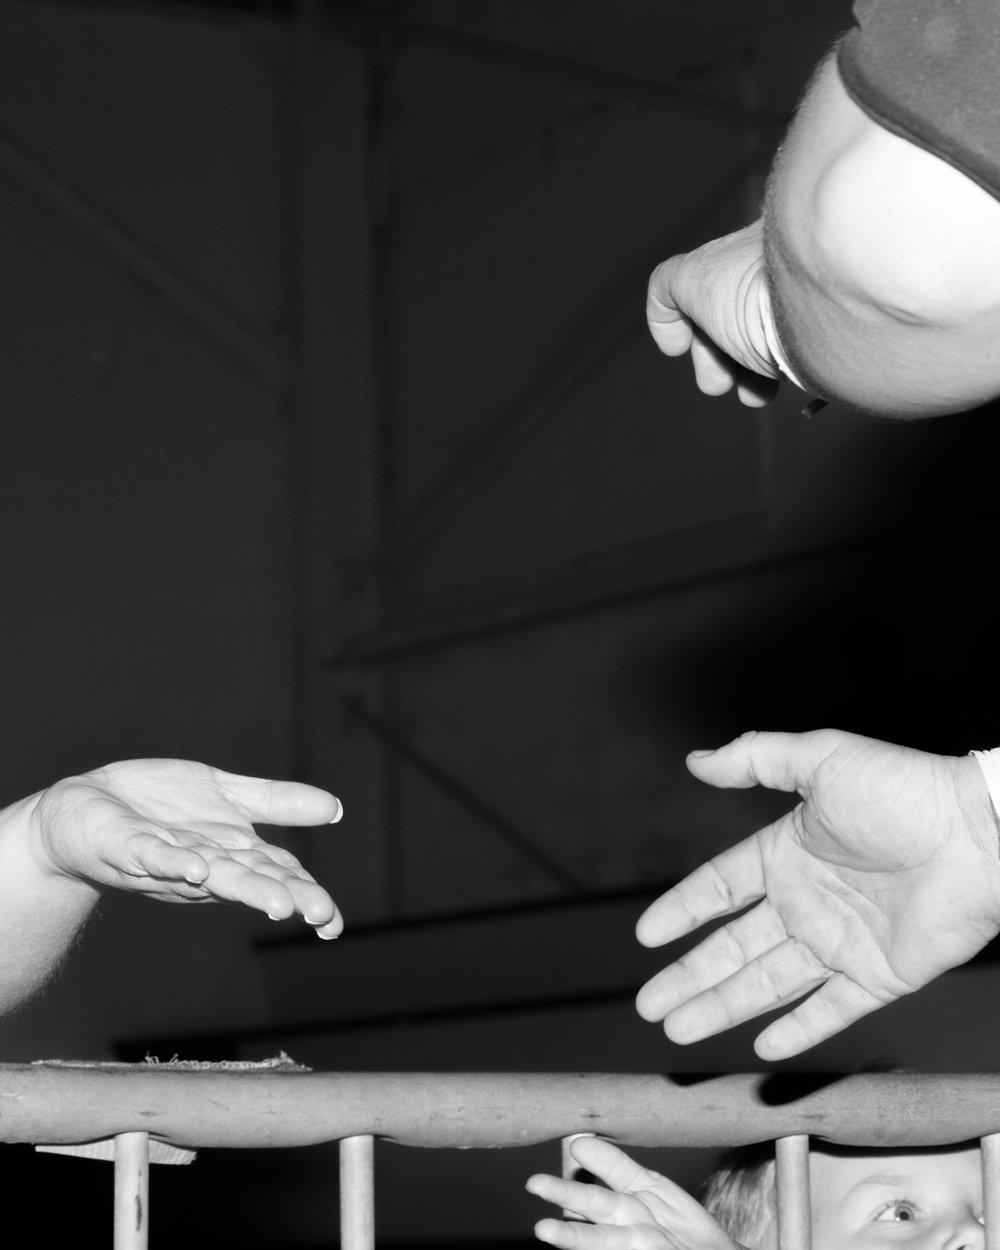 Alternative Pro Wrestling, Royston, GA. 2017. Digital Image.